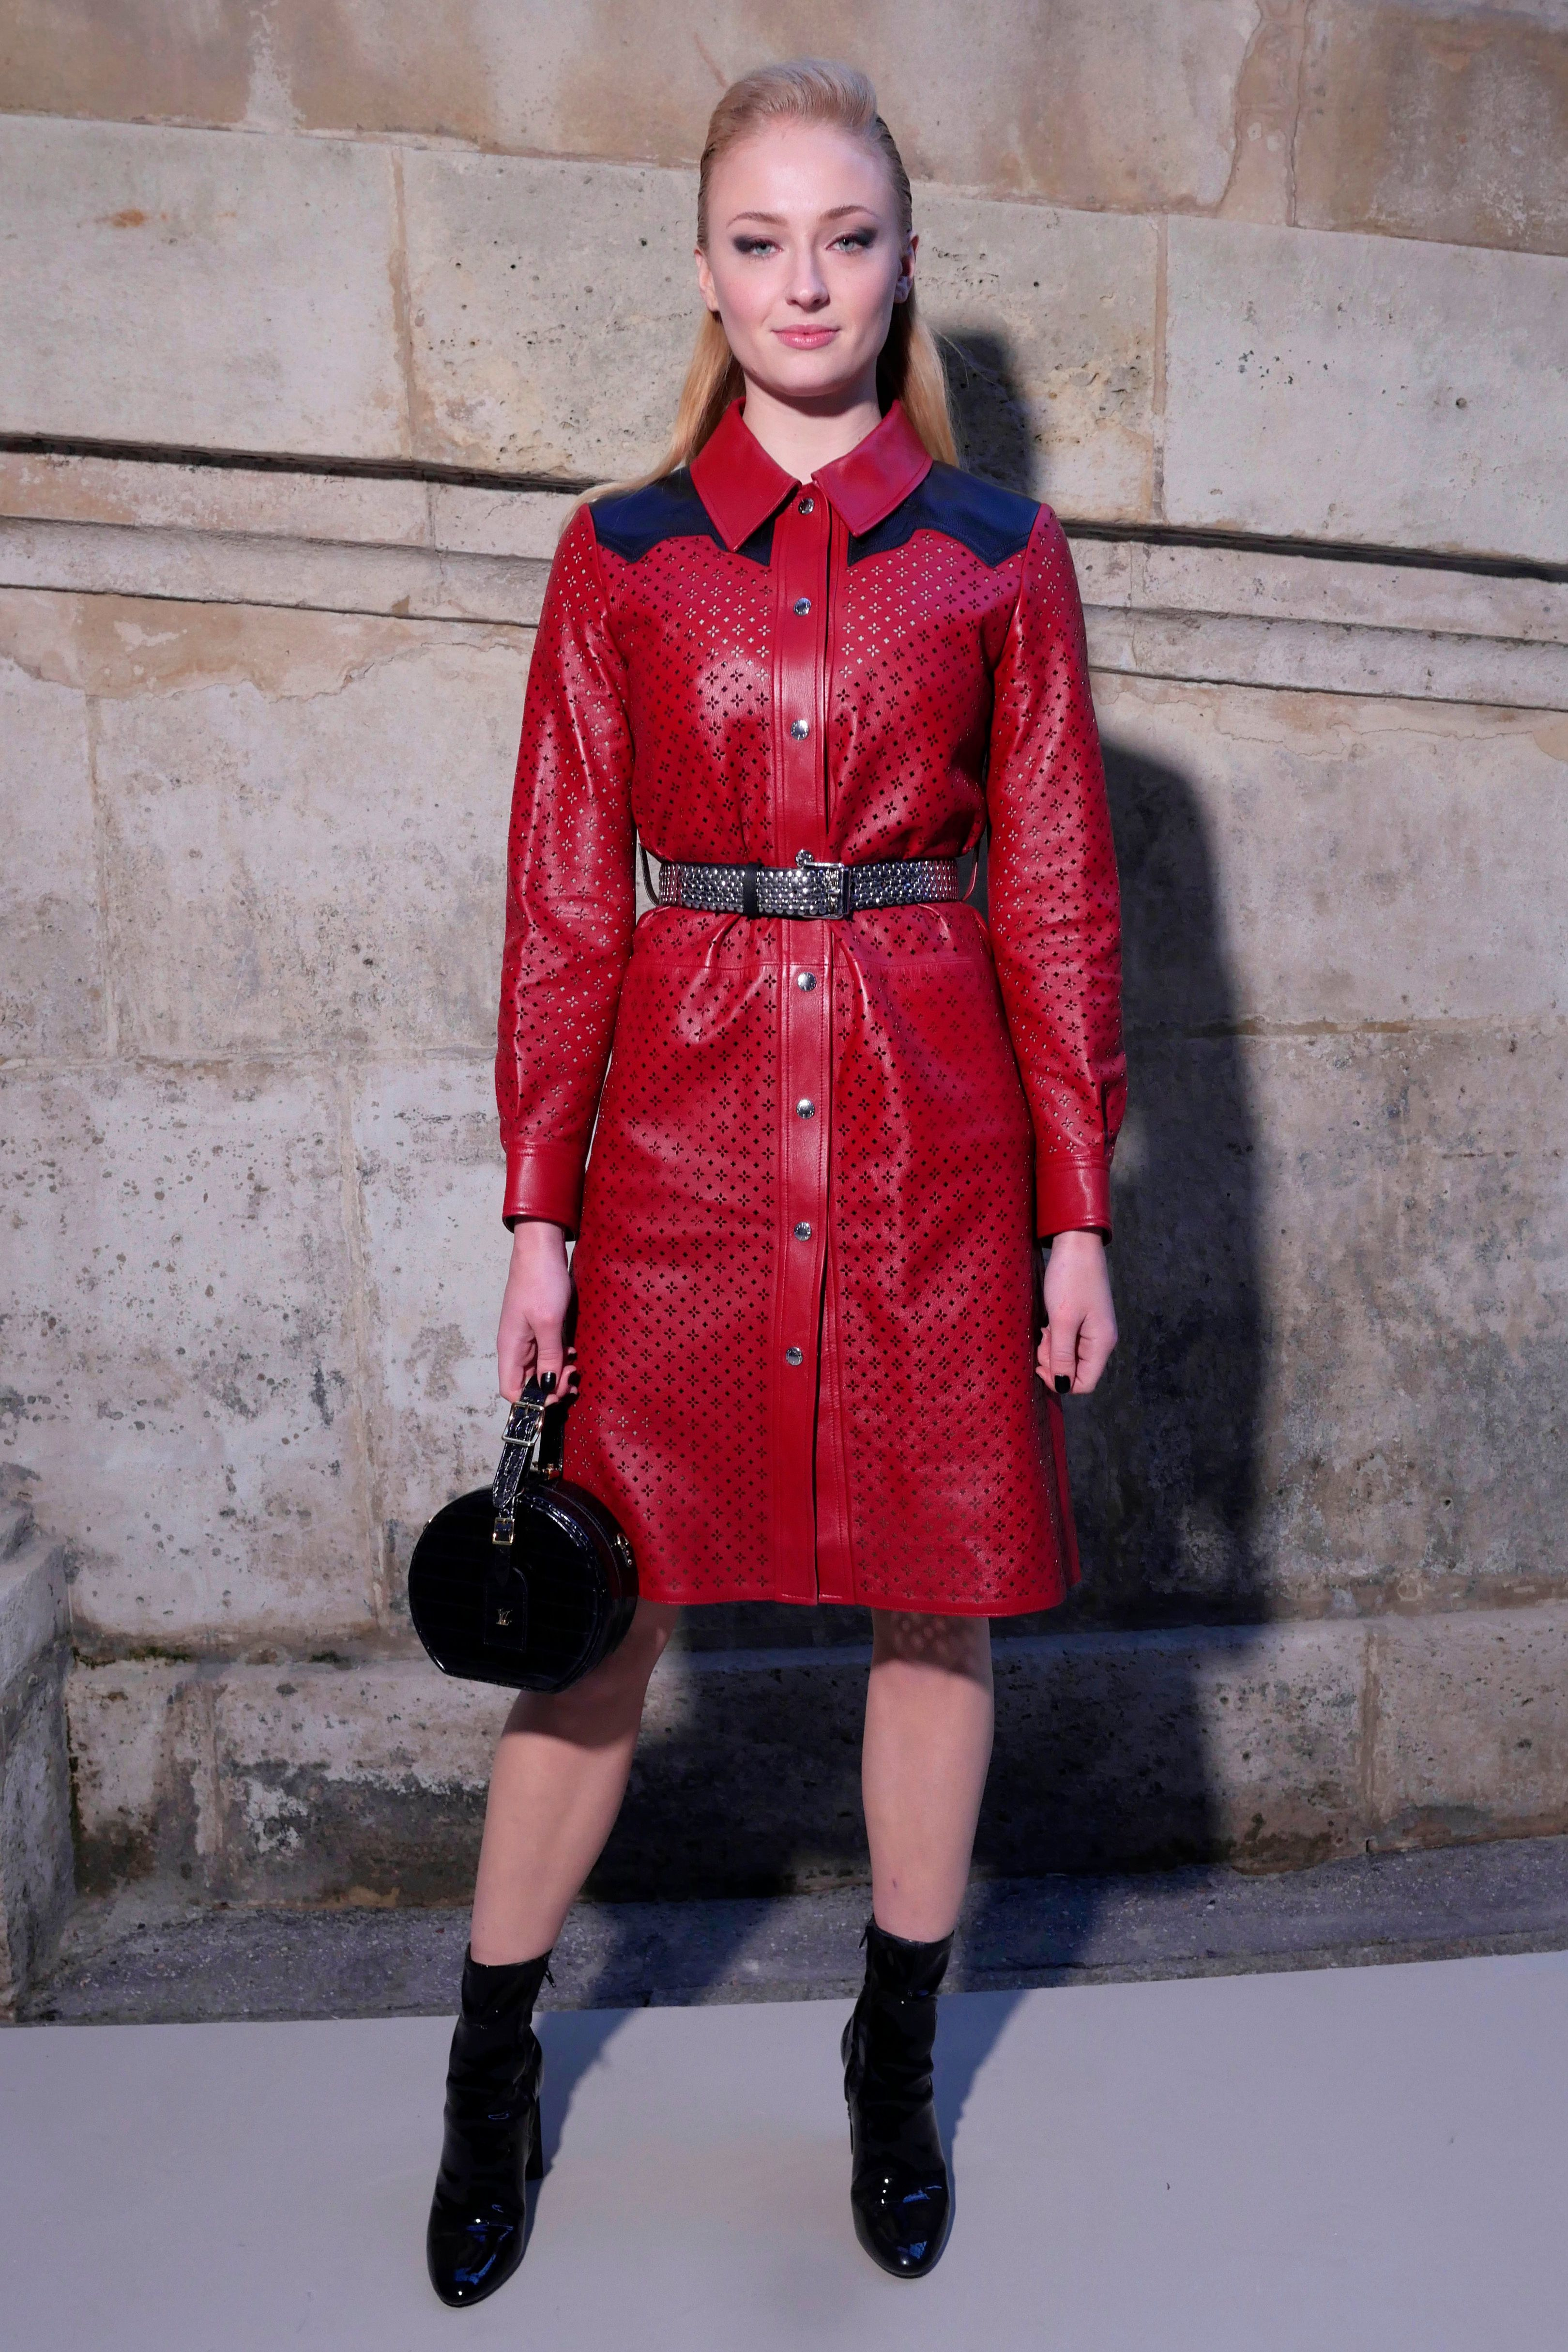 Sophie Turner Red leather dress, Fashion, Paris fashion week